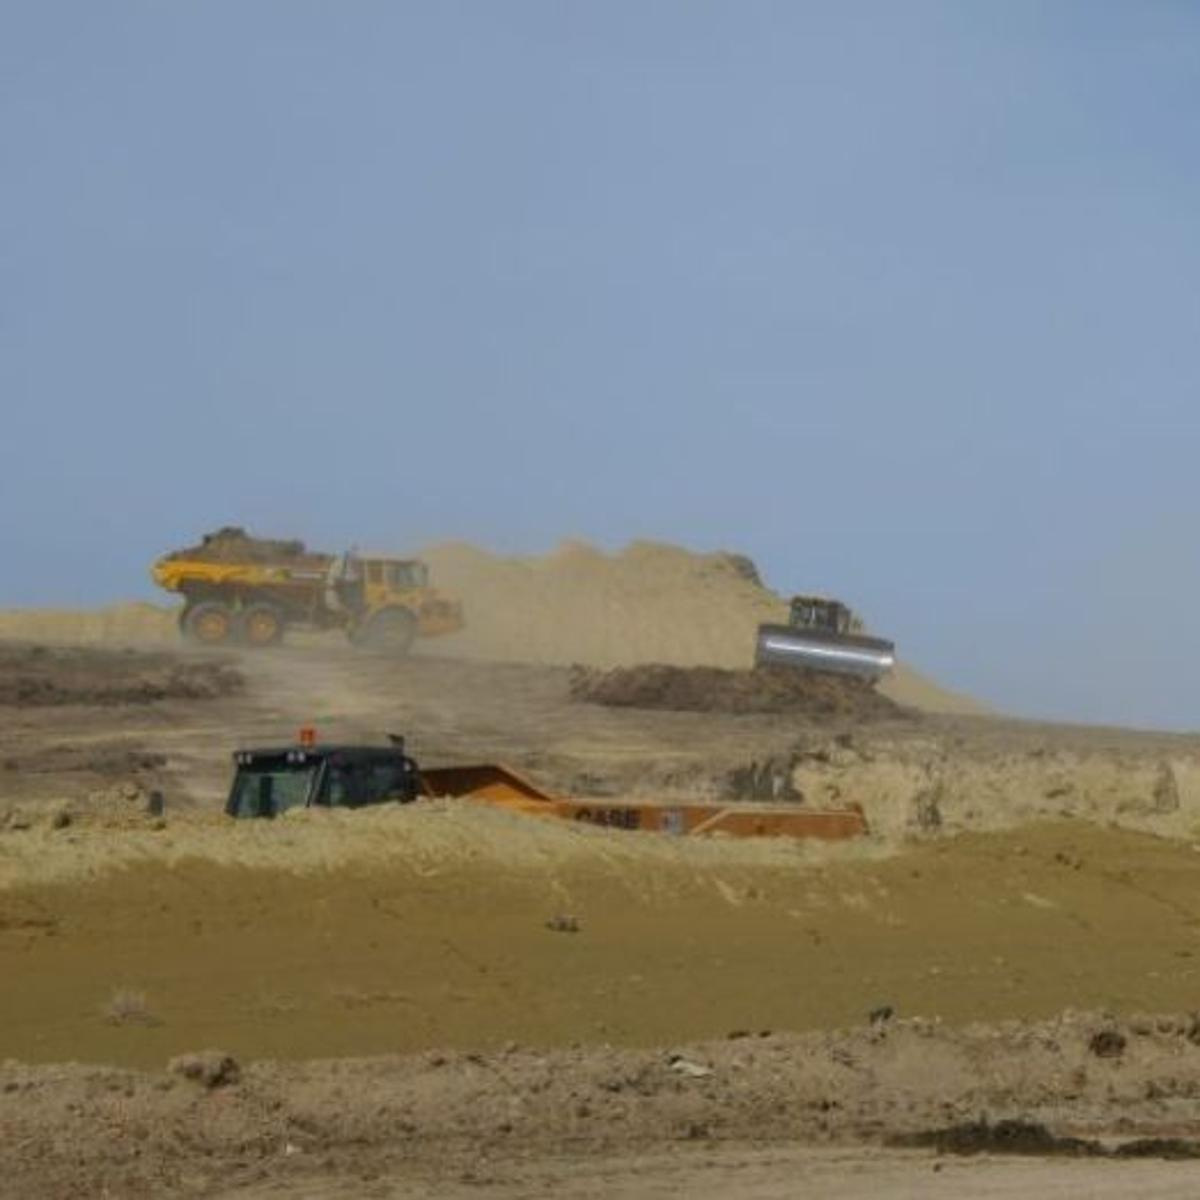 Montana entrepreneur capitalizes on radioactive waste from